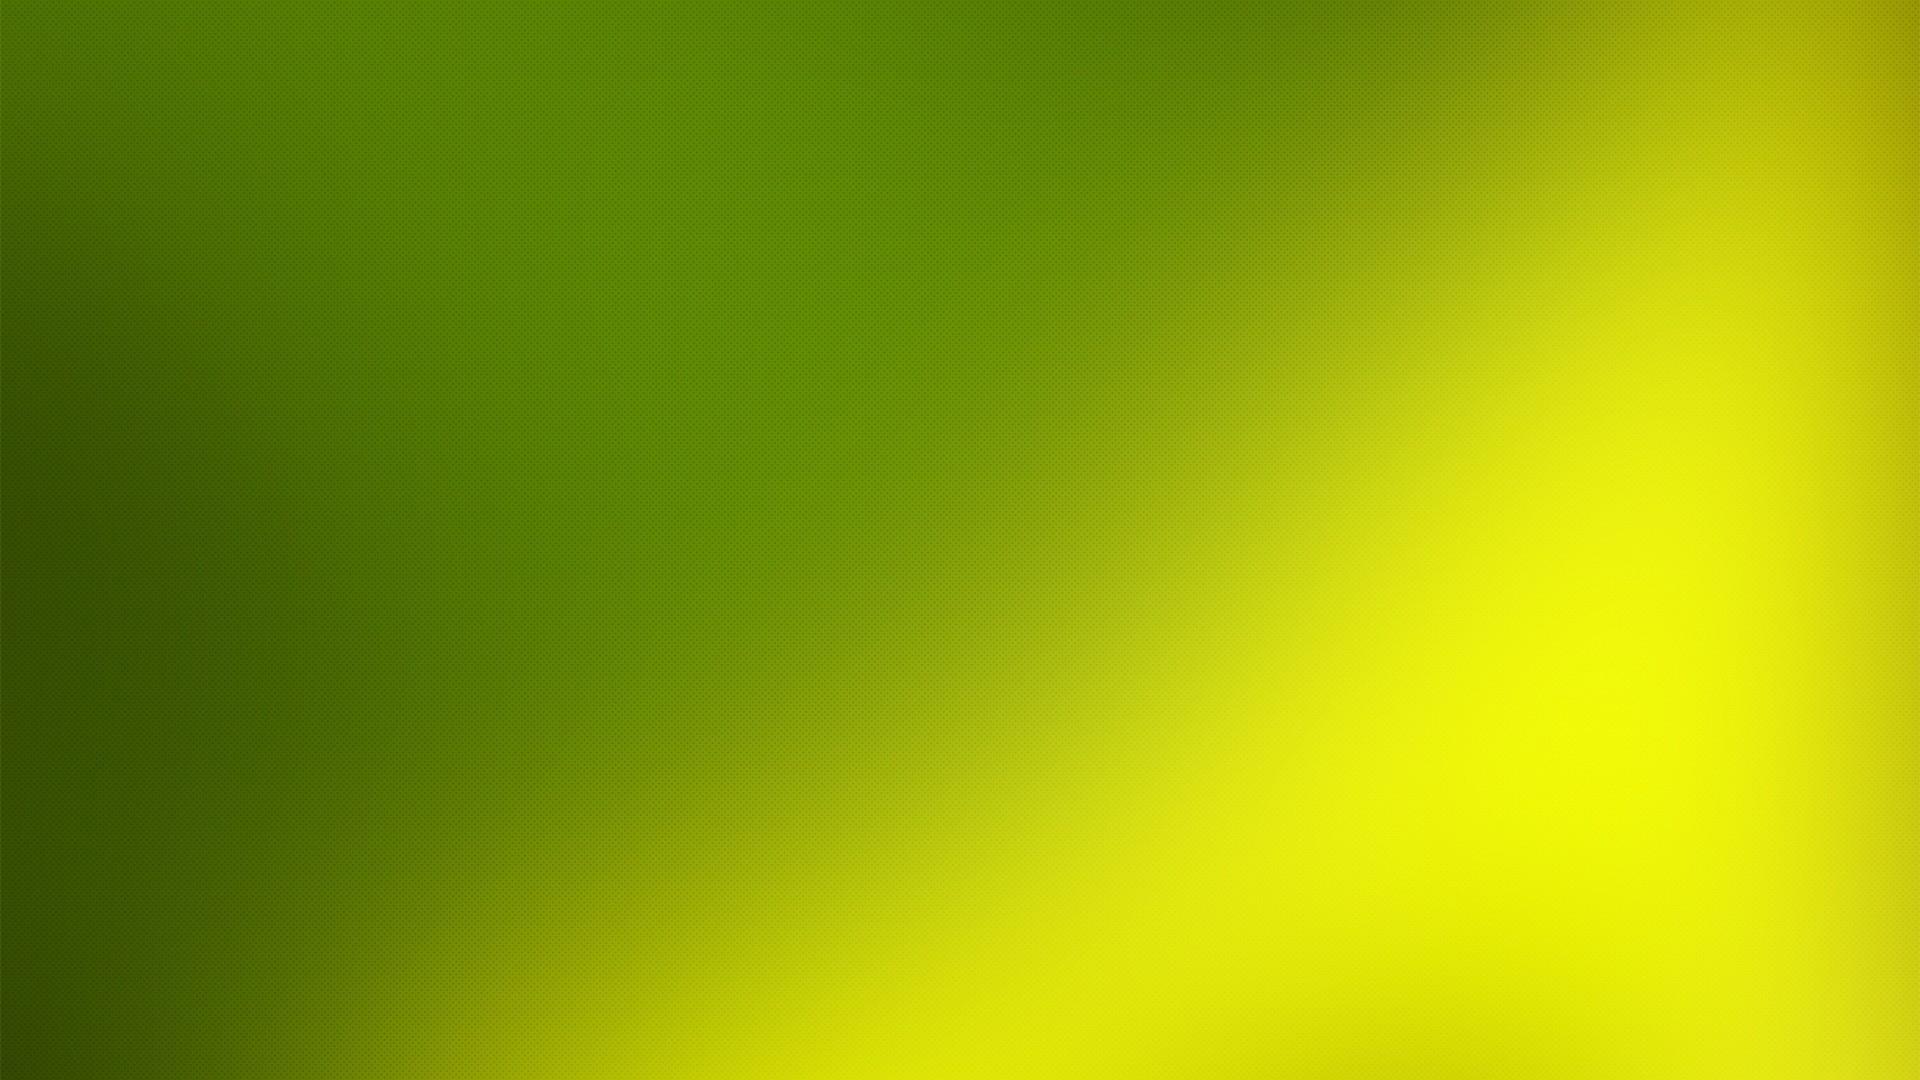 Wallpaper : sunlight, green, yellow, circle, light, color ...